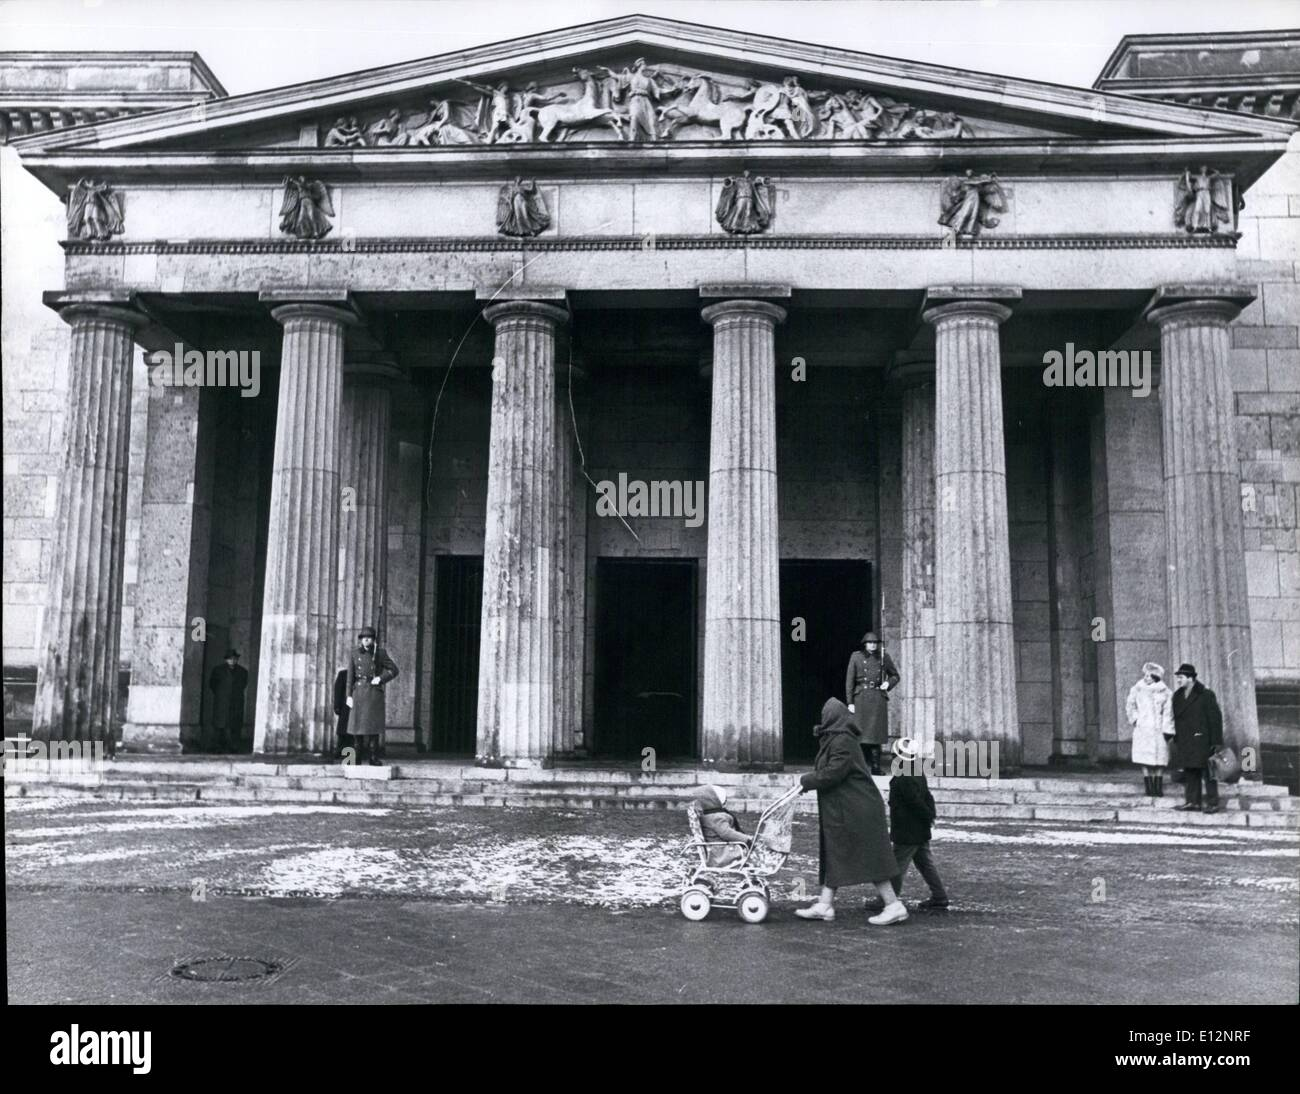 Feb. 24, 2012 - East Berlin Memorial for the victims of Fascism $ militarism at Unter Den Linden. Stock Photo